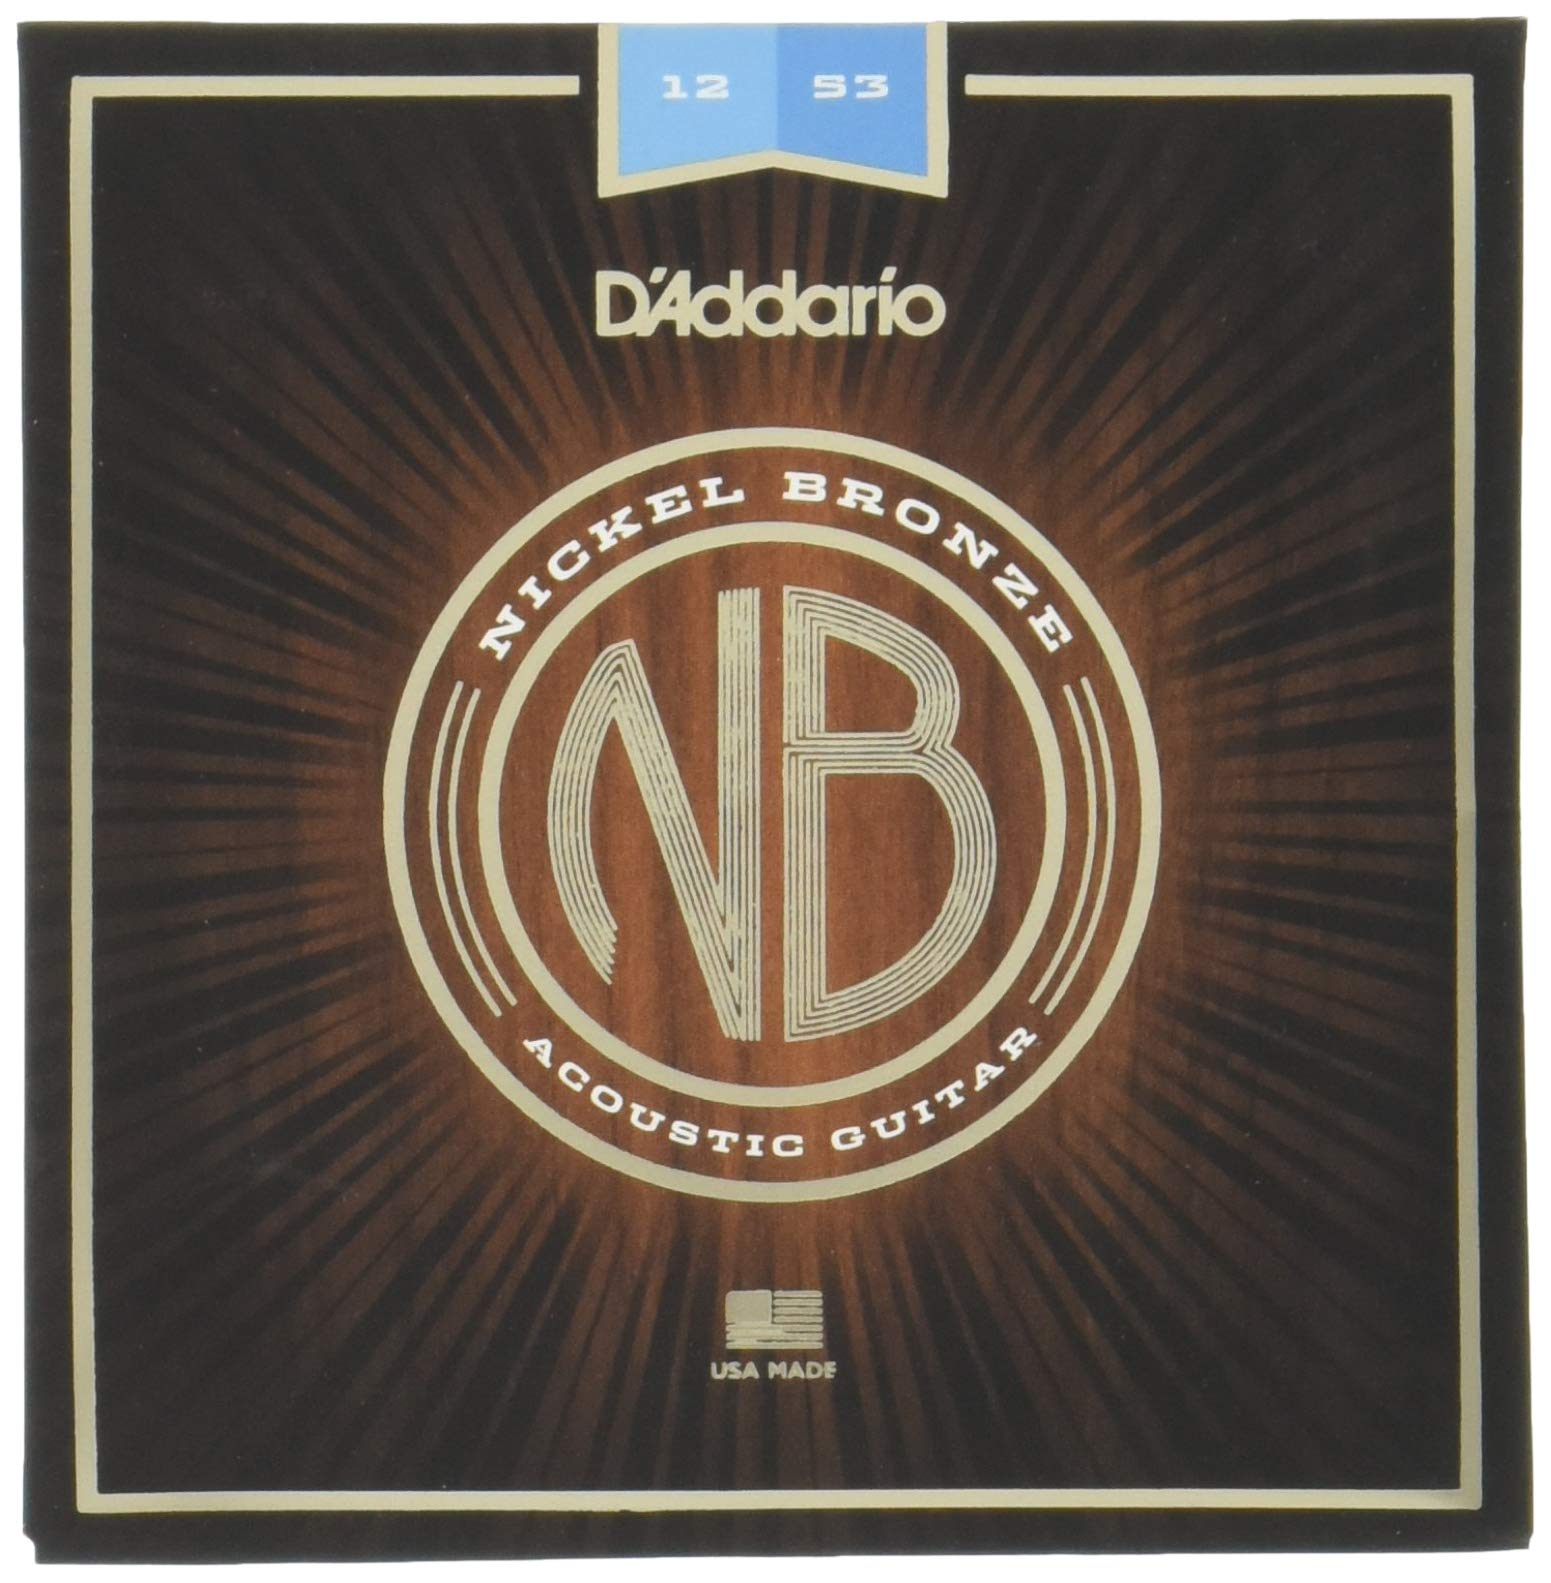 DAddario NB1253 - Cuerdas para guitarra acústica (6 cuerdas, níquel/bronce